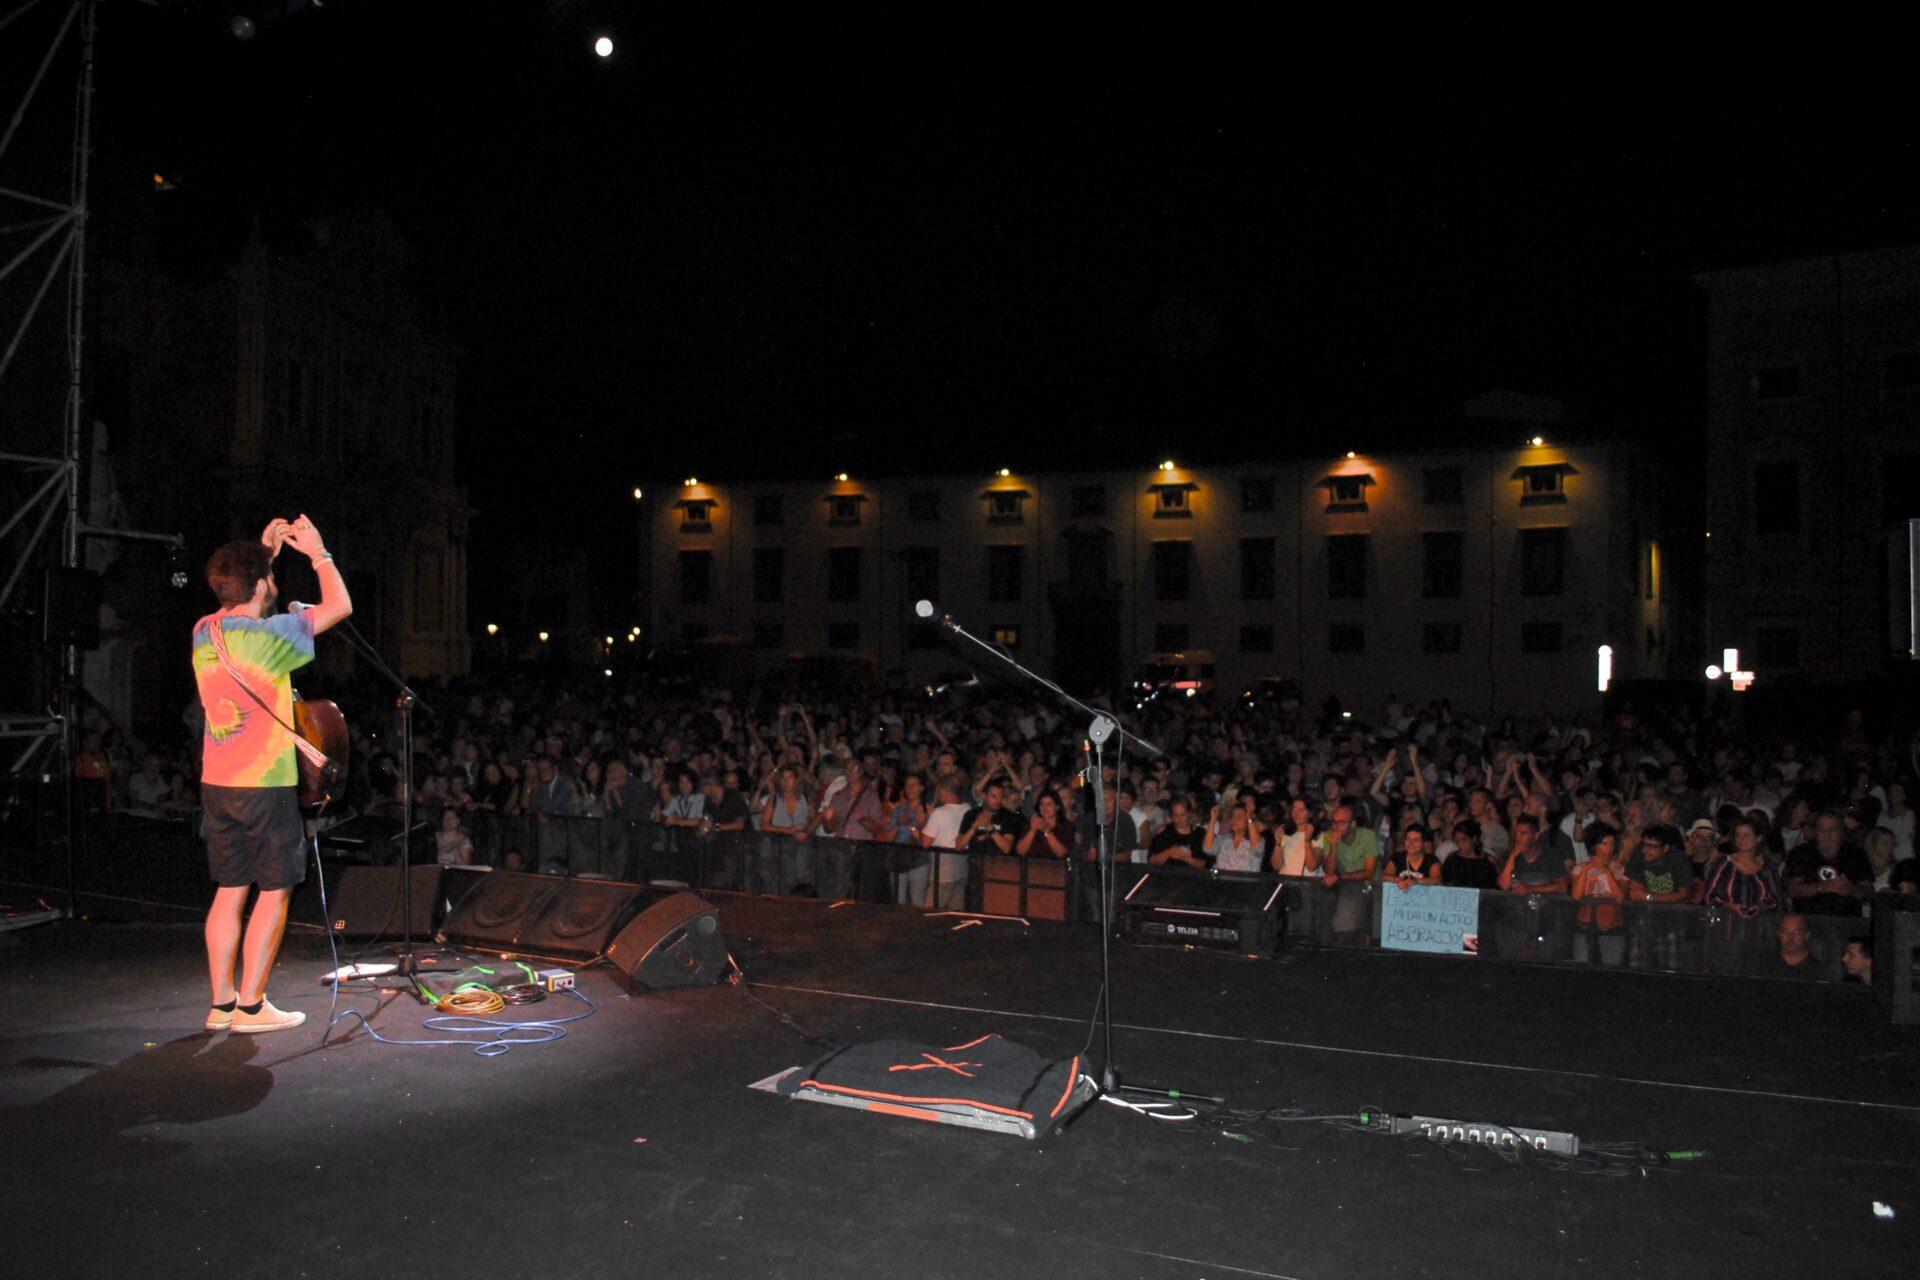 https://andreabrunini.com/wp-content/uploads/2019/09/Piazza-dei-cavalieri-7-1920x1280.jpg